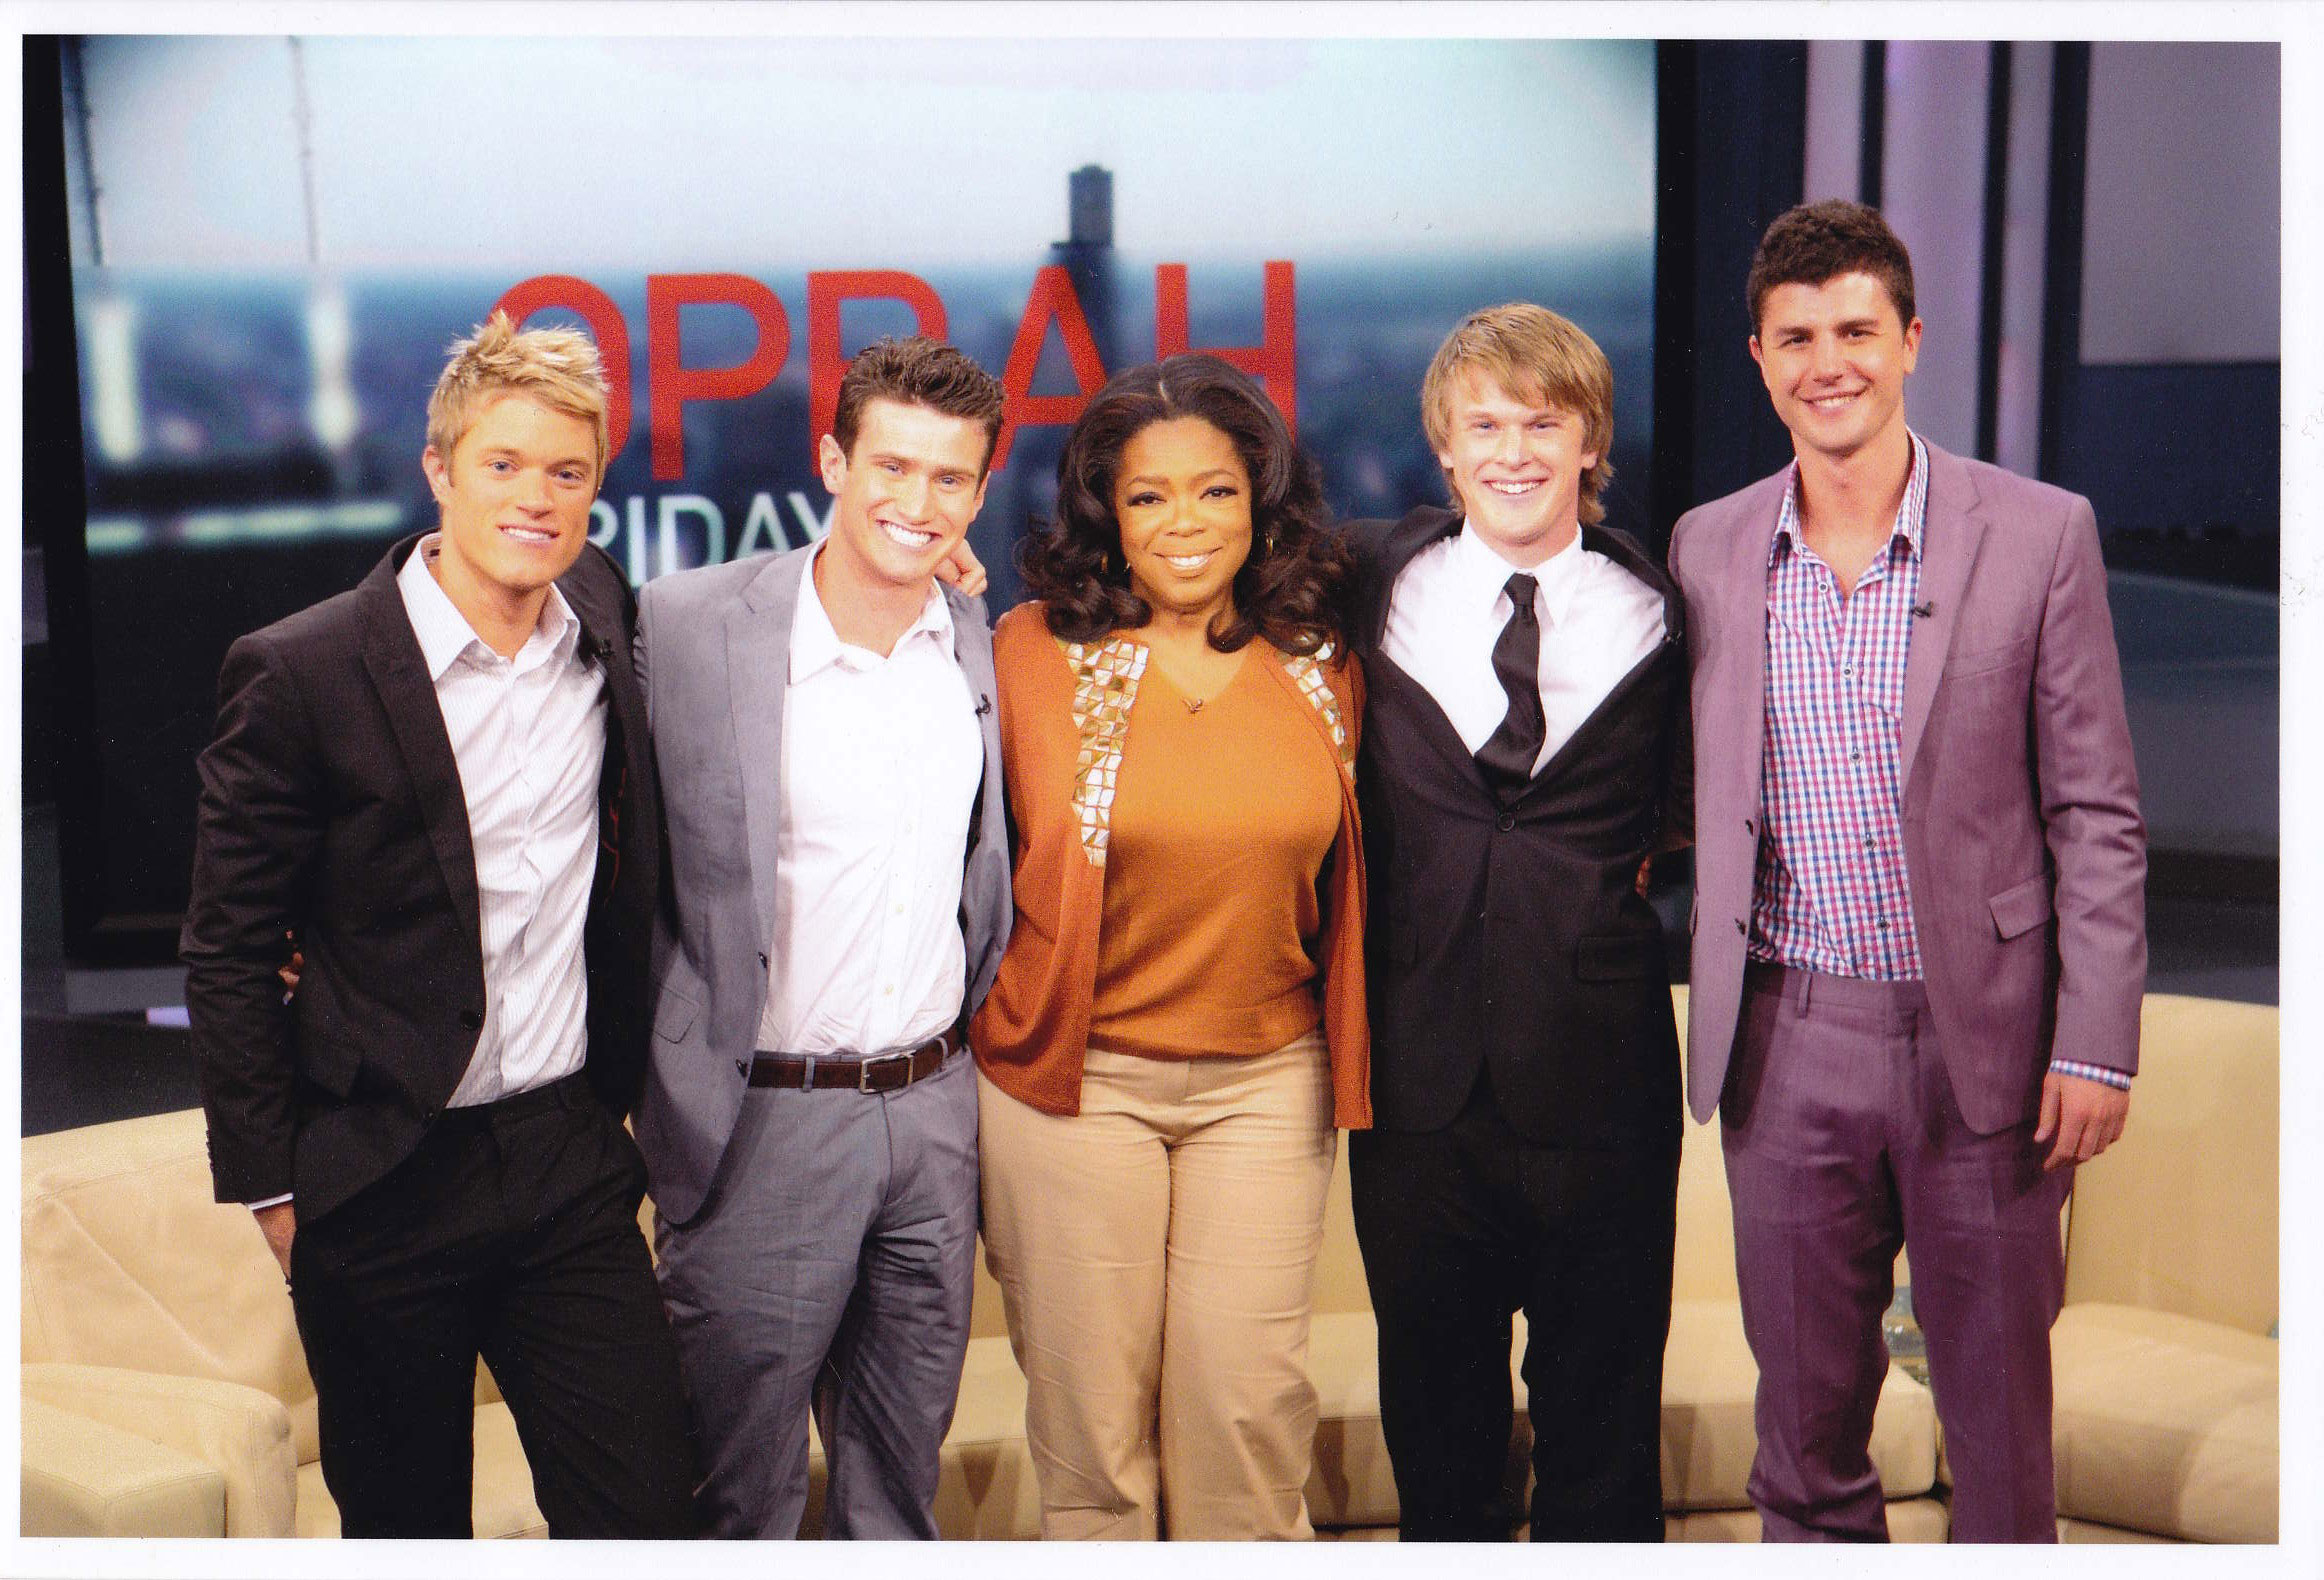 TBL-on-Oprah.jpg